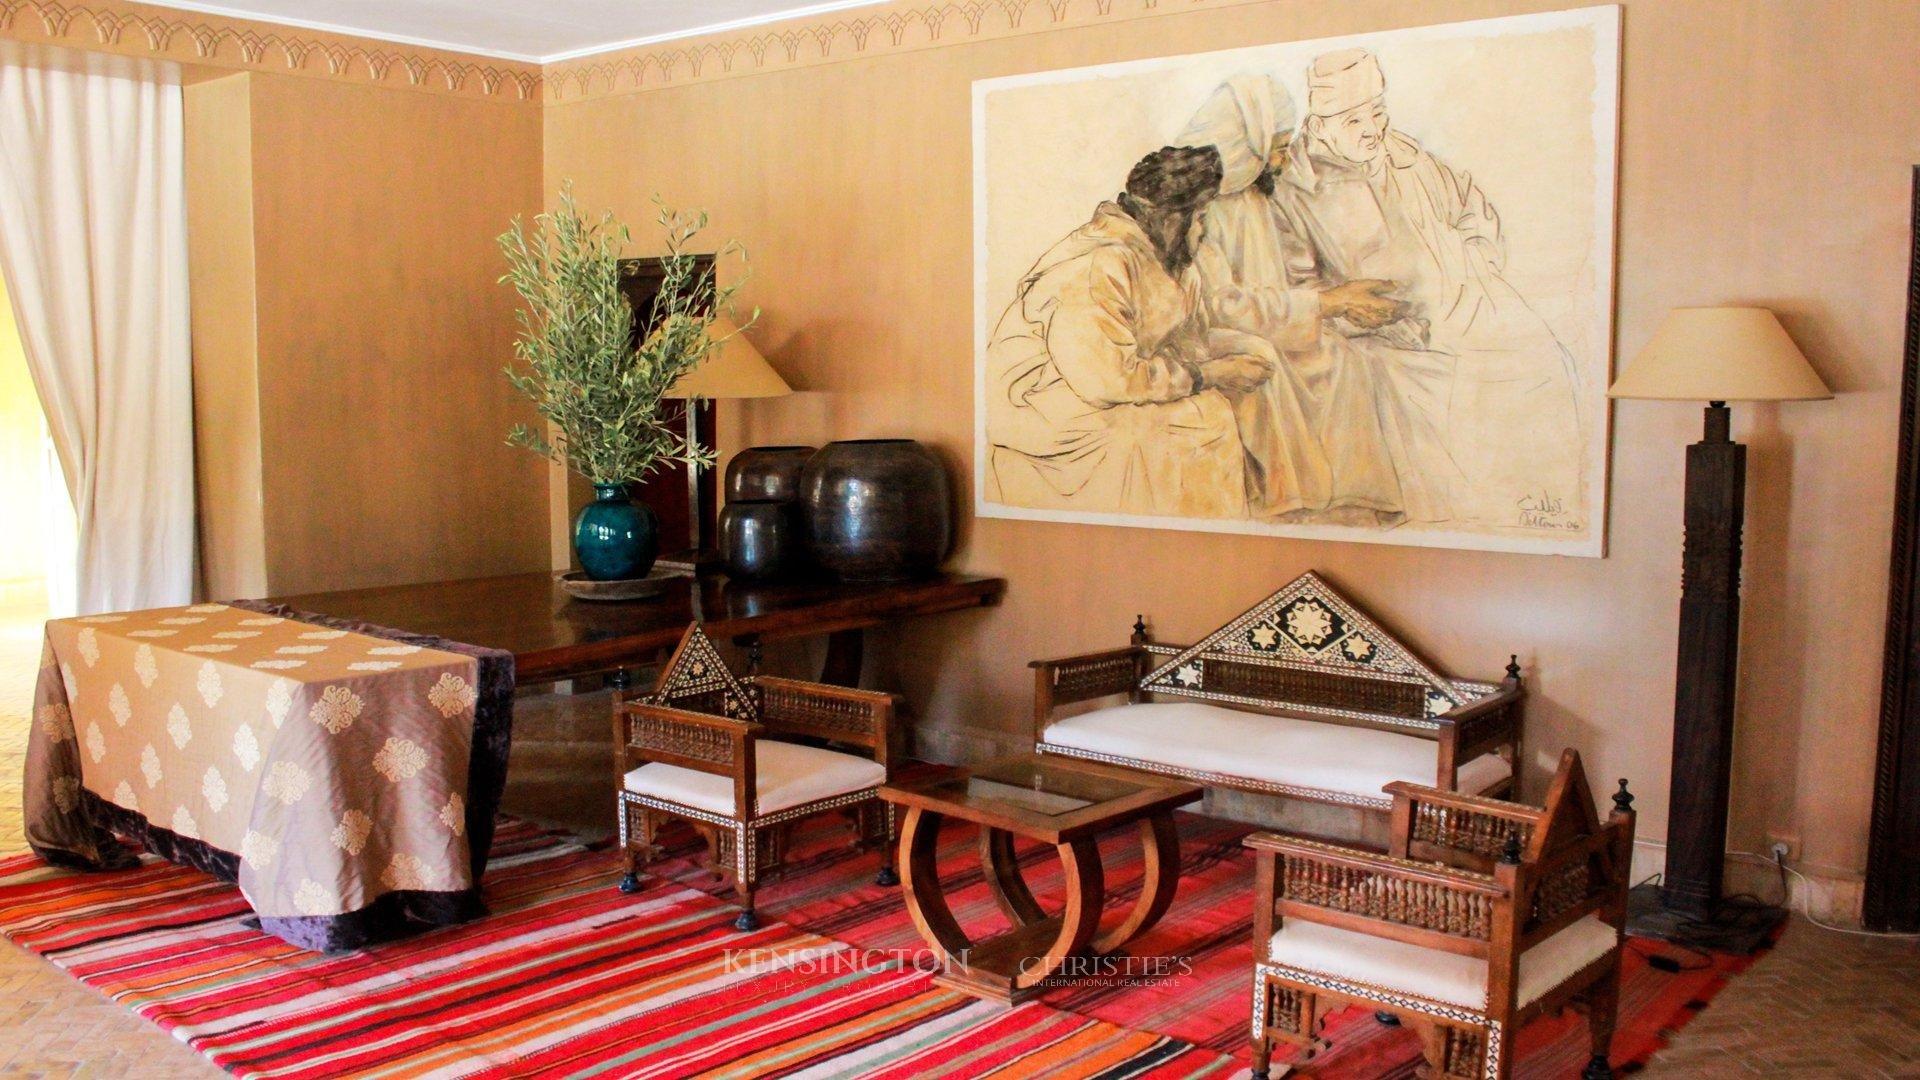 KPPM00652: Jnamena Villa Luxury Villa Marrakech Morocco